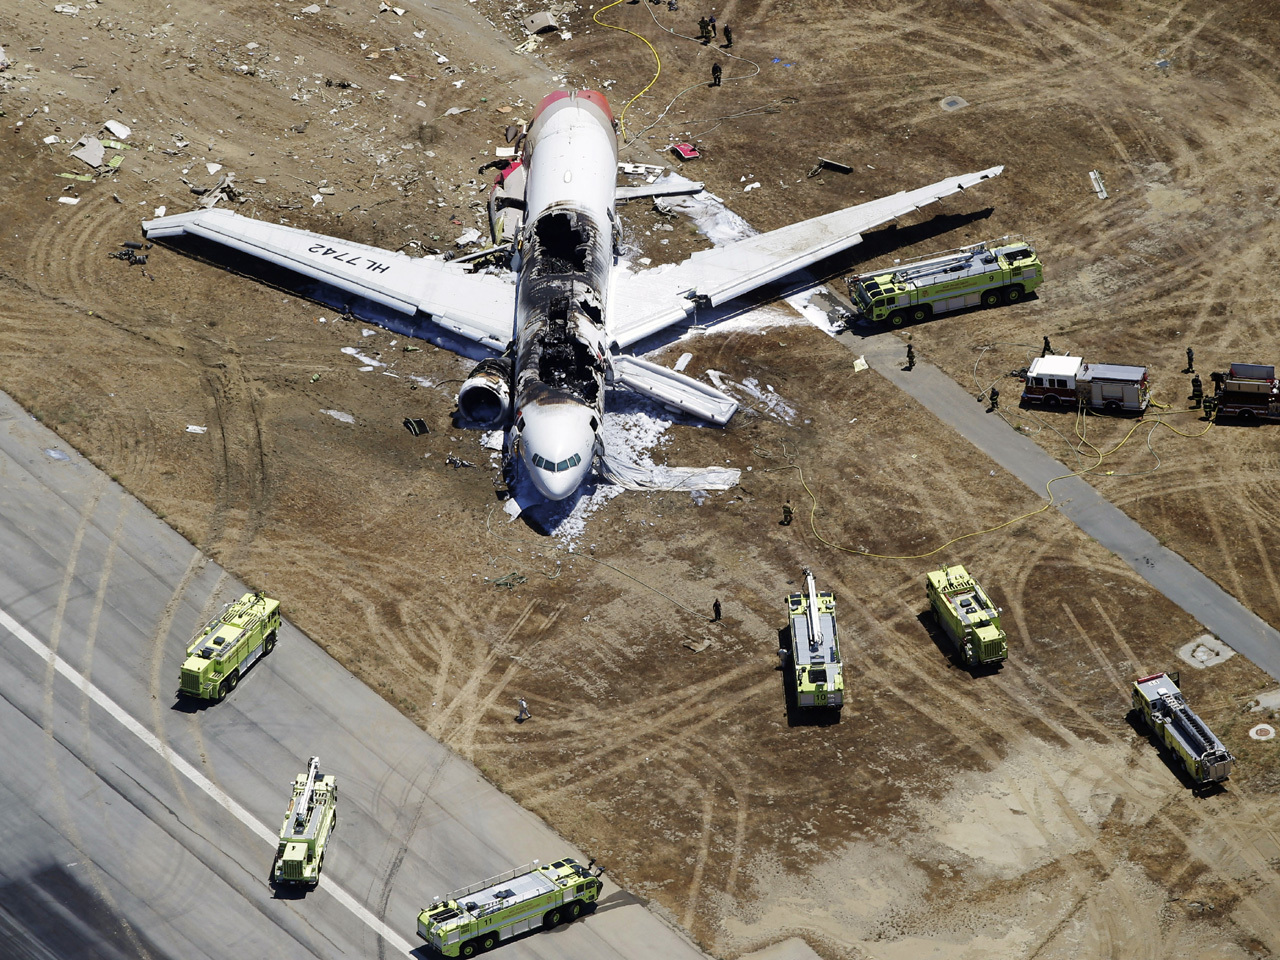 Plane crash at San Francisco airport, 2 dead - CBS News